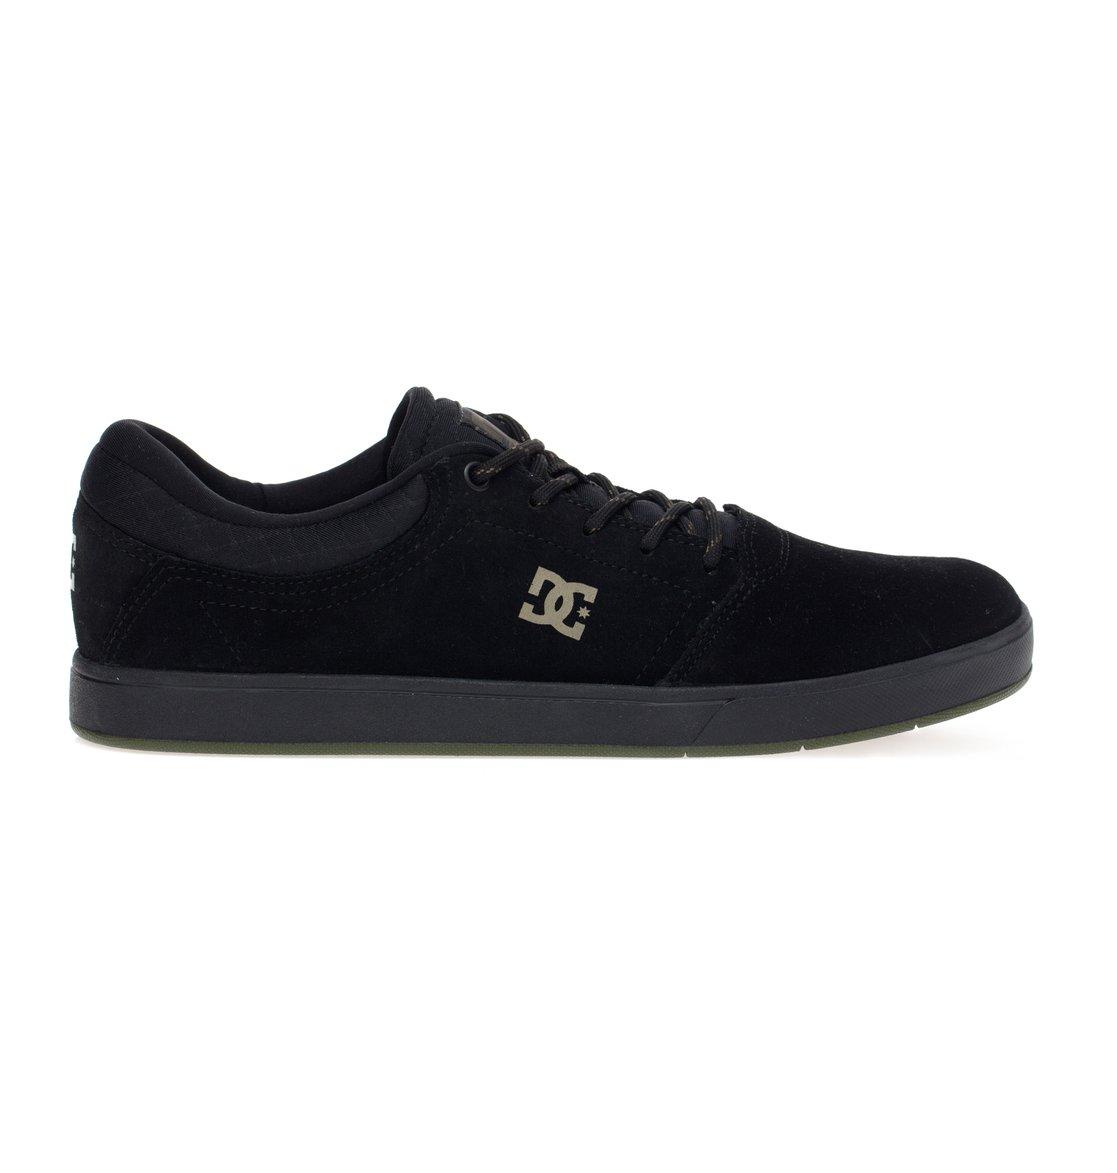 4f88d942aa 0 DC SHOE CRISIS SE LA BRADYS100284L DC Shoes